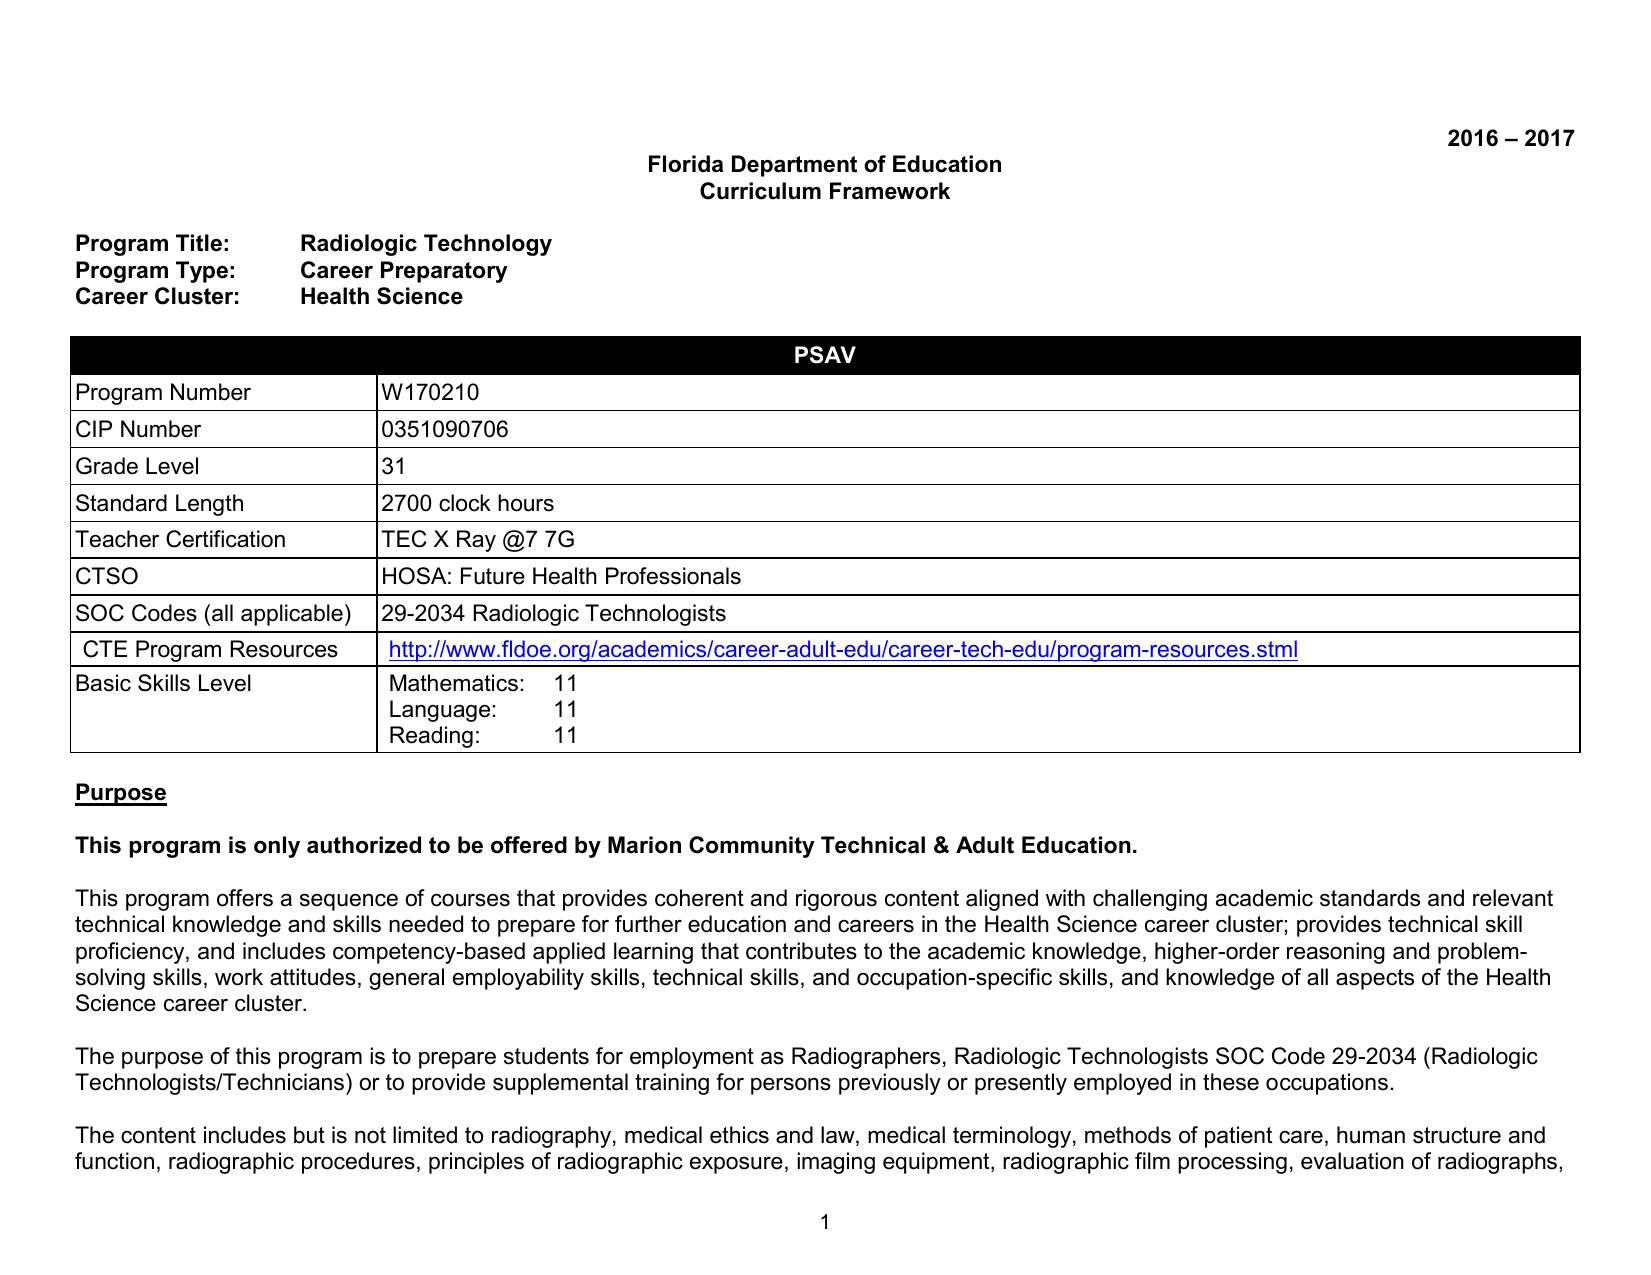 Radiologic Technology (W170210) - Florida Department Of